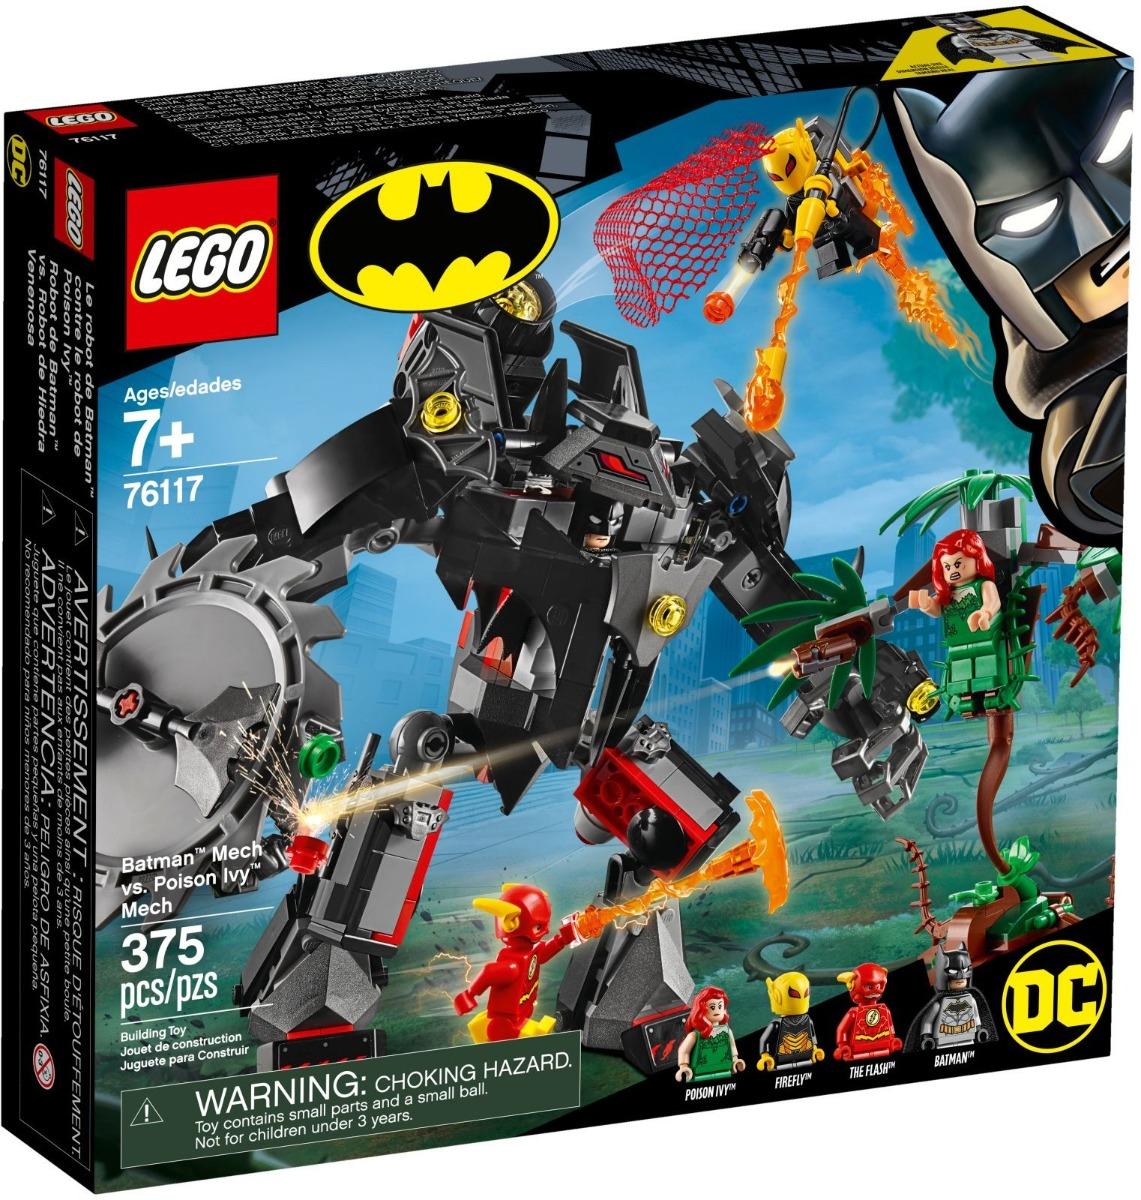 Poza LEGO® DC Super Heroes - Robotul Batman™ contra Robotul Poison Ivy™ (76117)